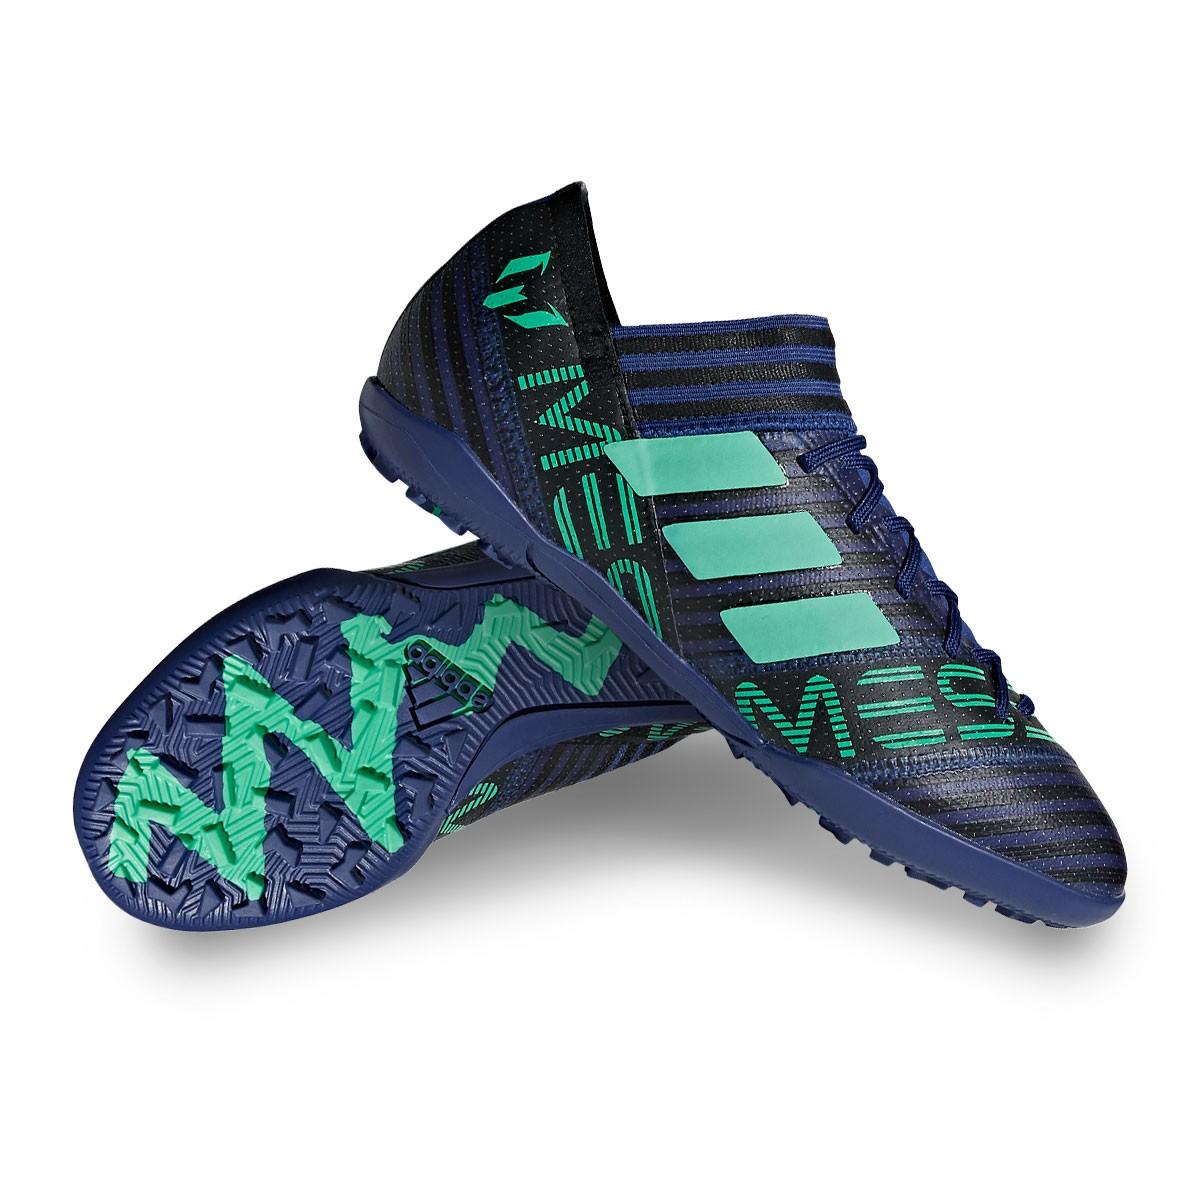 0be25c31bf75 Football Boot adidas Kids Nemeziz Messi Tango 17.3 Turf Unity ink-Hi ...